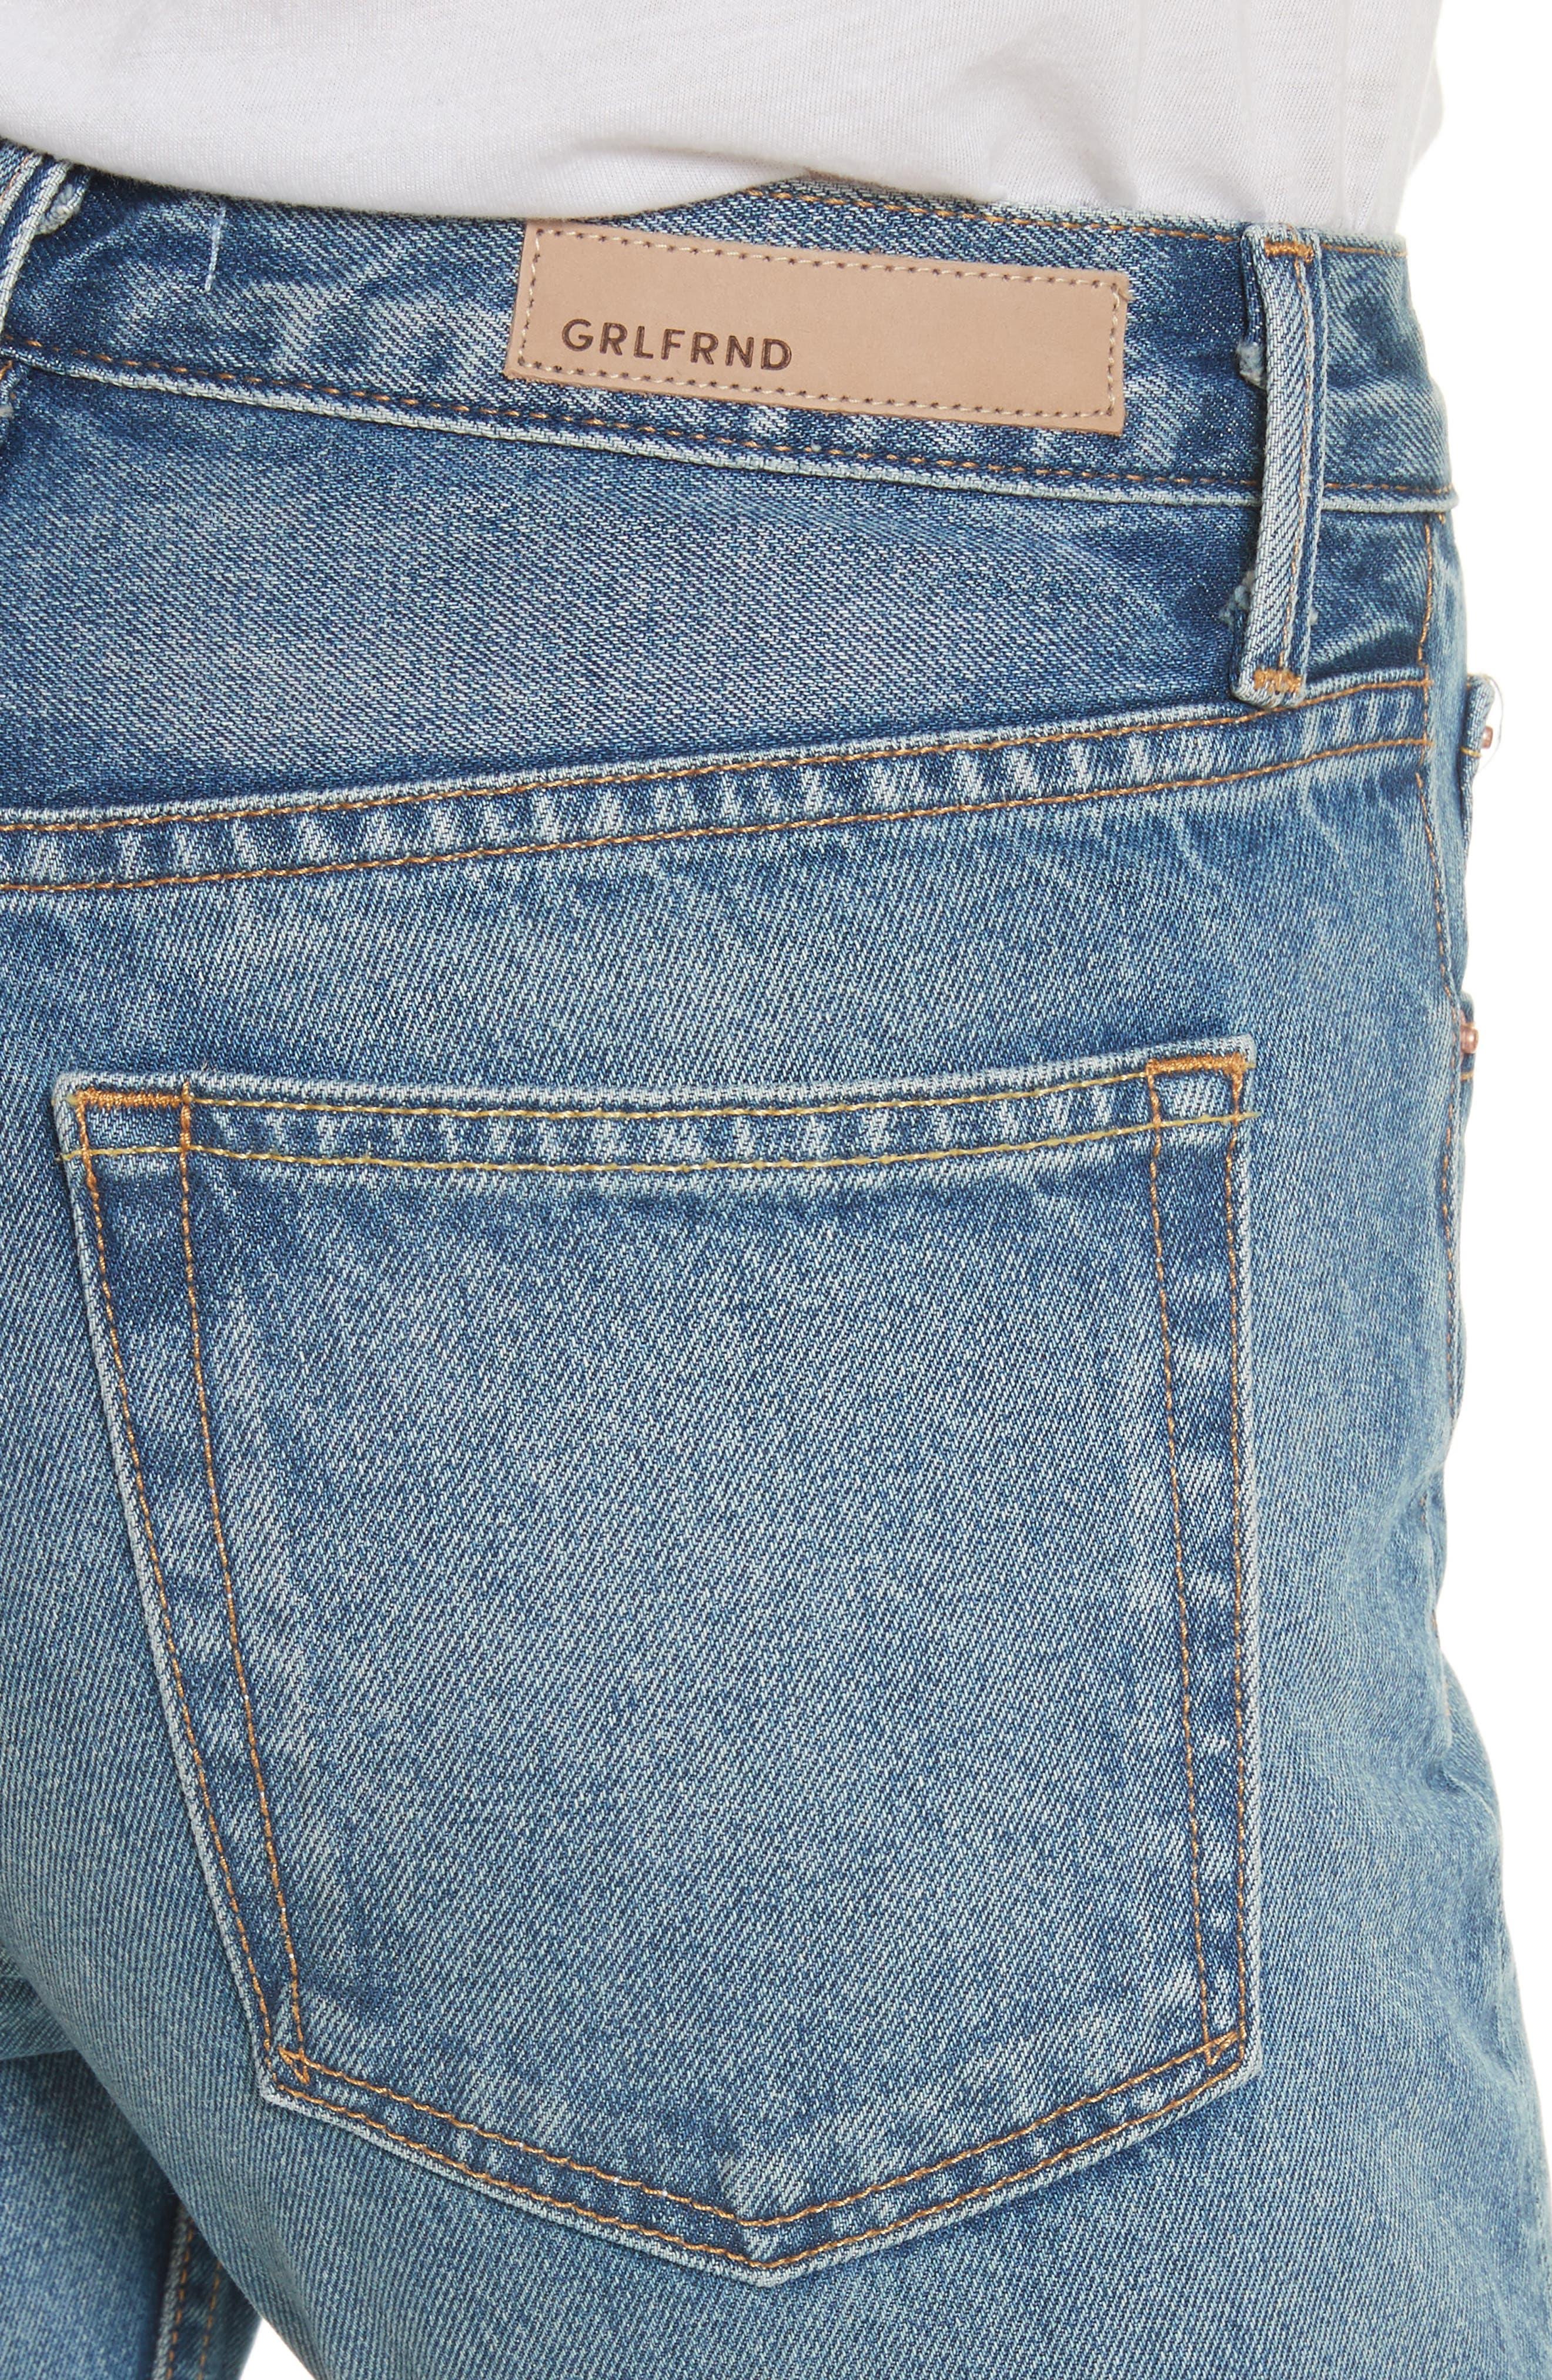 Karolina Faux Pearl & Crystal Embellished Rigid High Waist Skinny Jeans,                             Alternate thumbnail 4, color,                             493